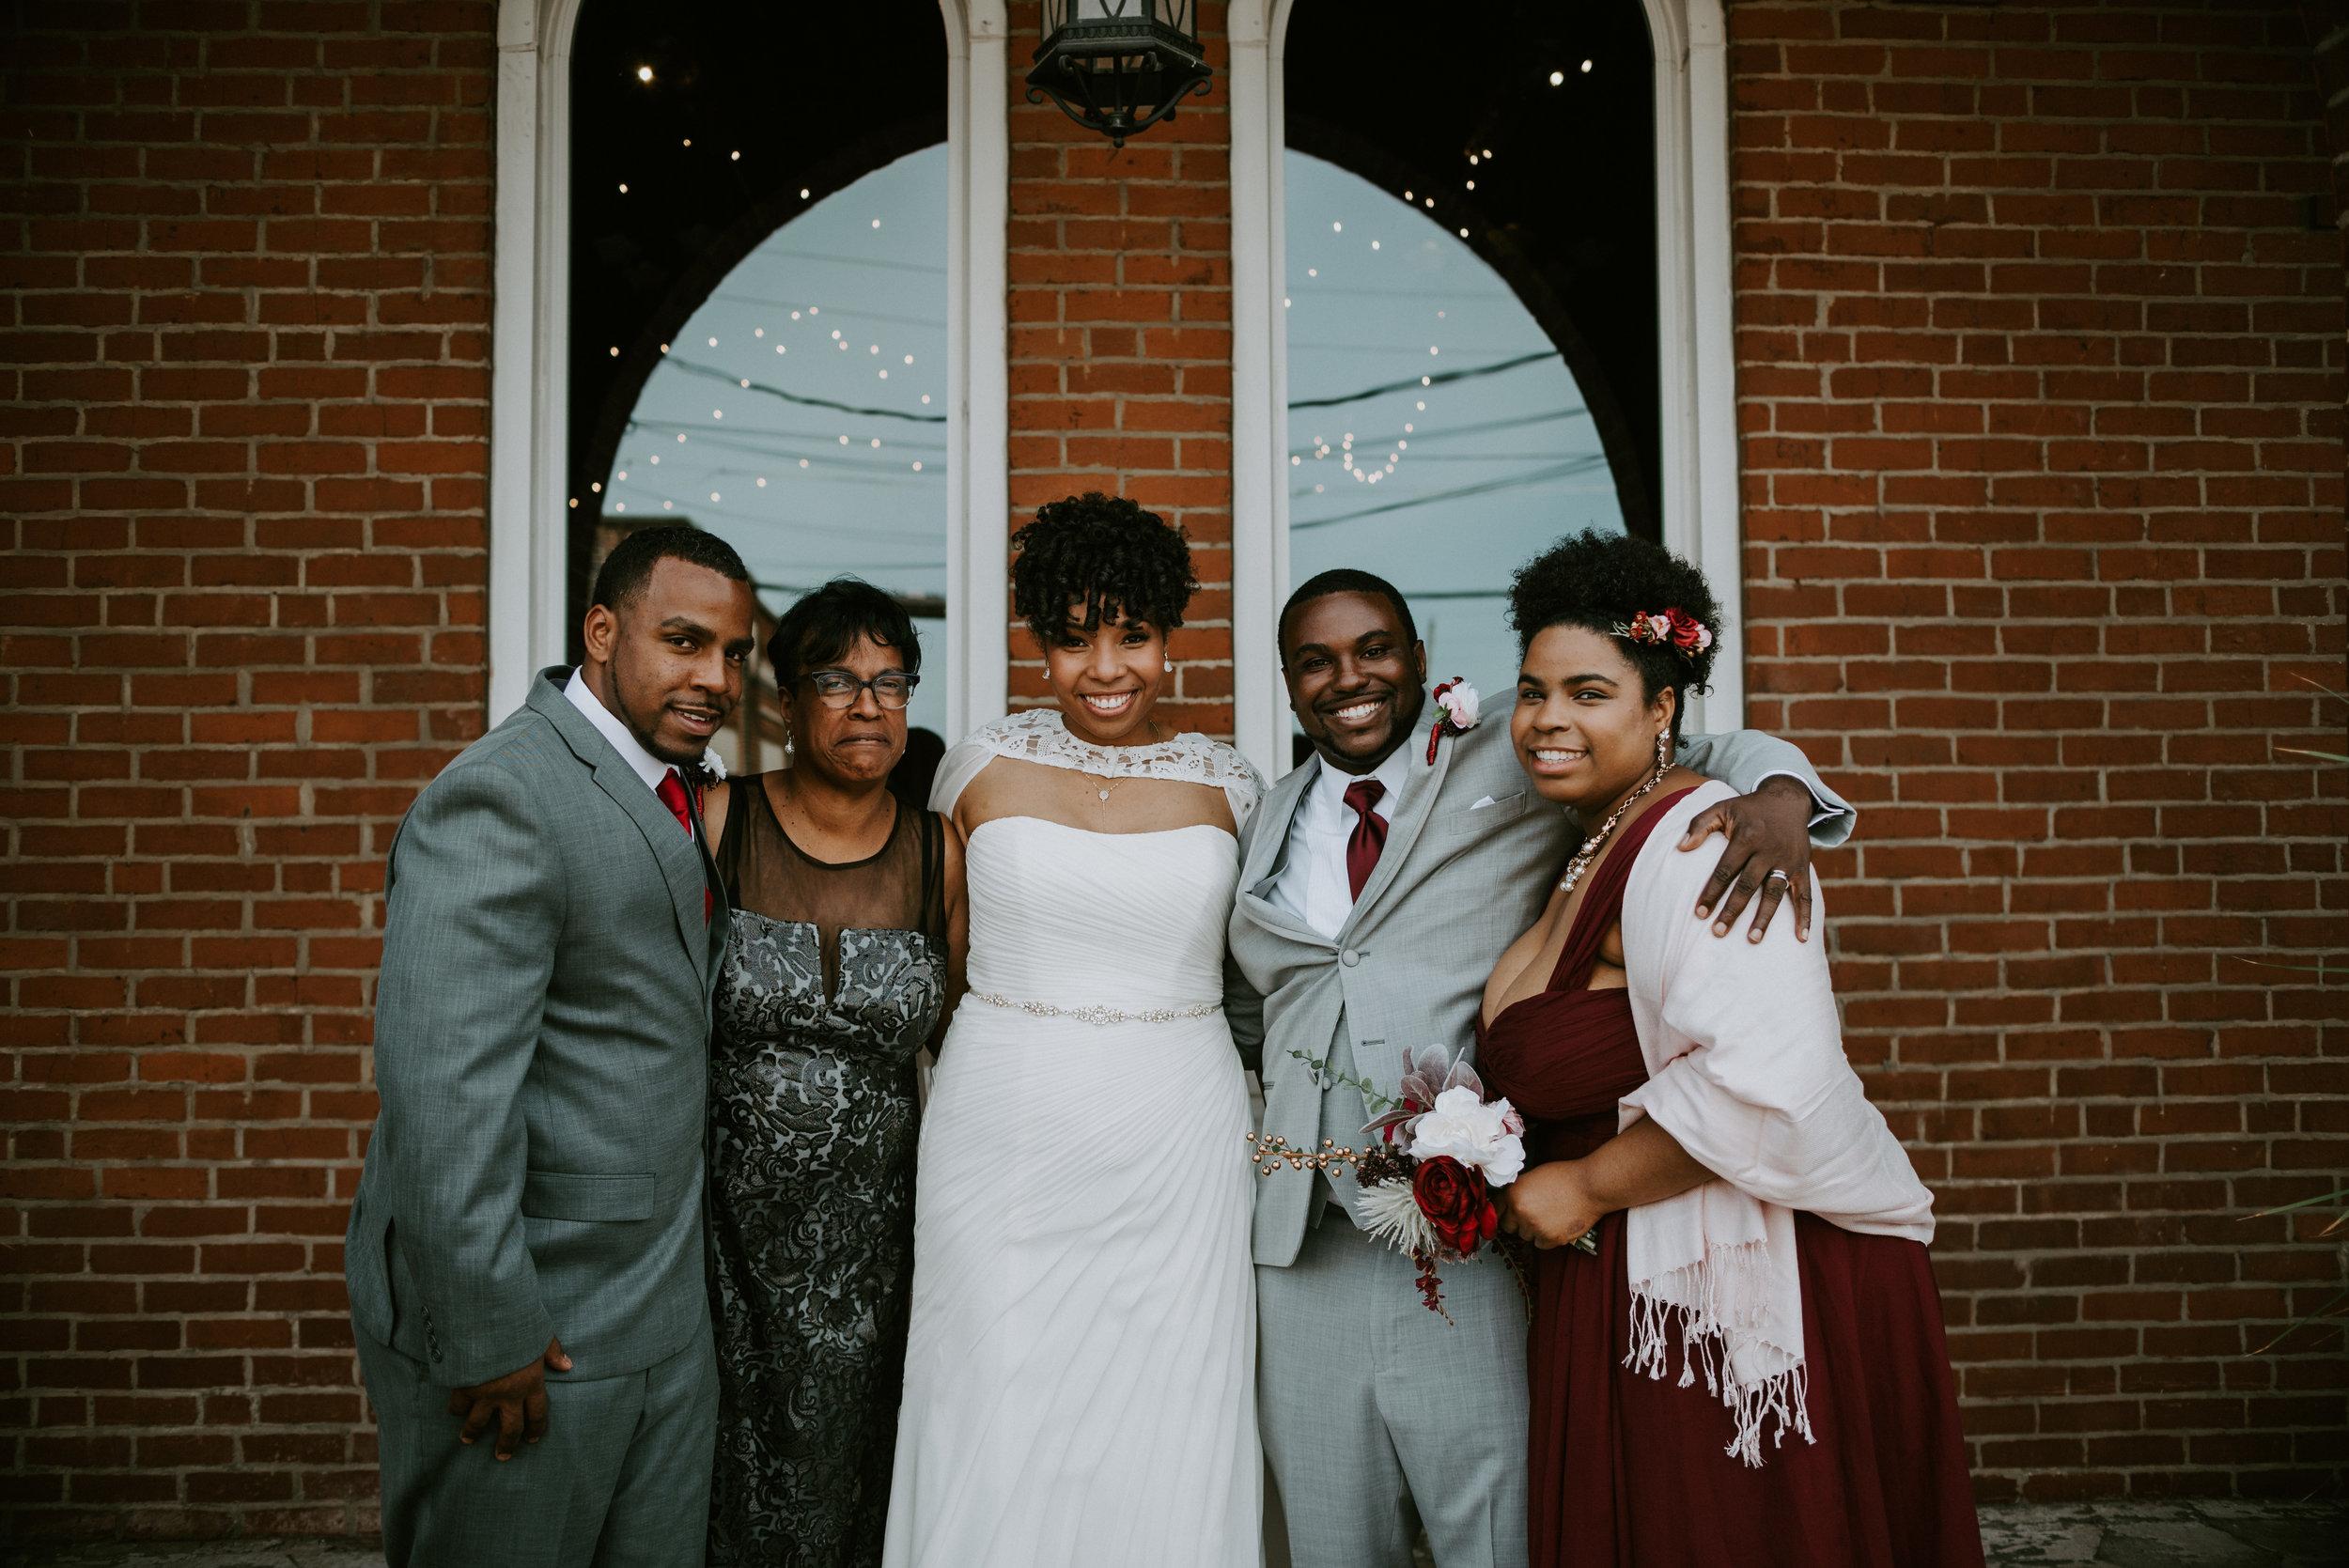 WonderlyCreative_Wedding_6.7.18_Khara&Dwayne_-588.jpg